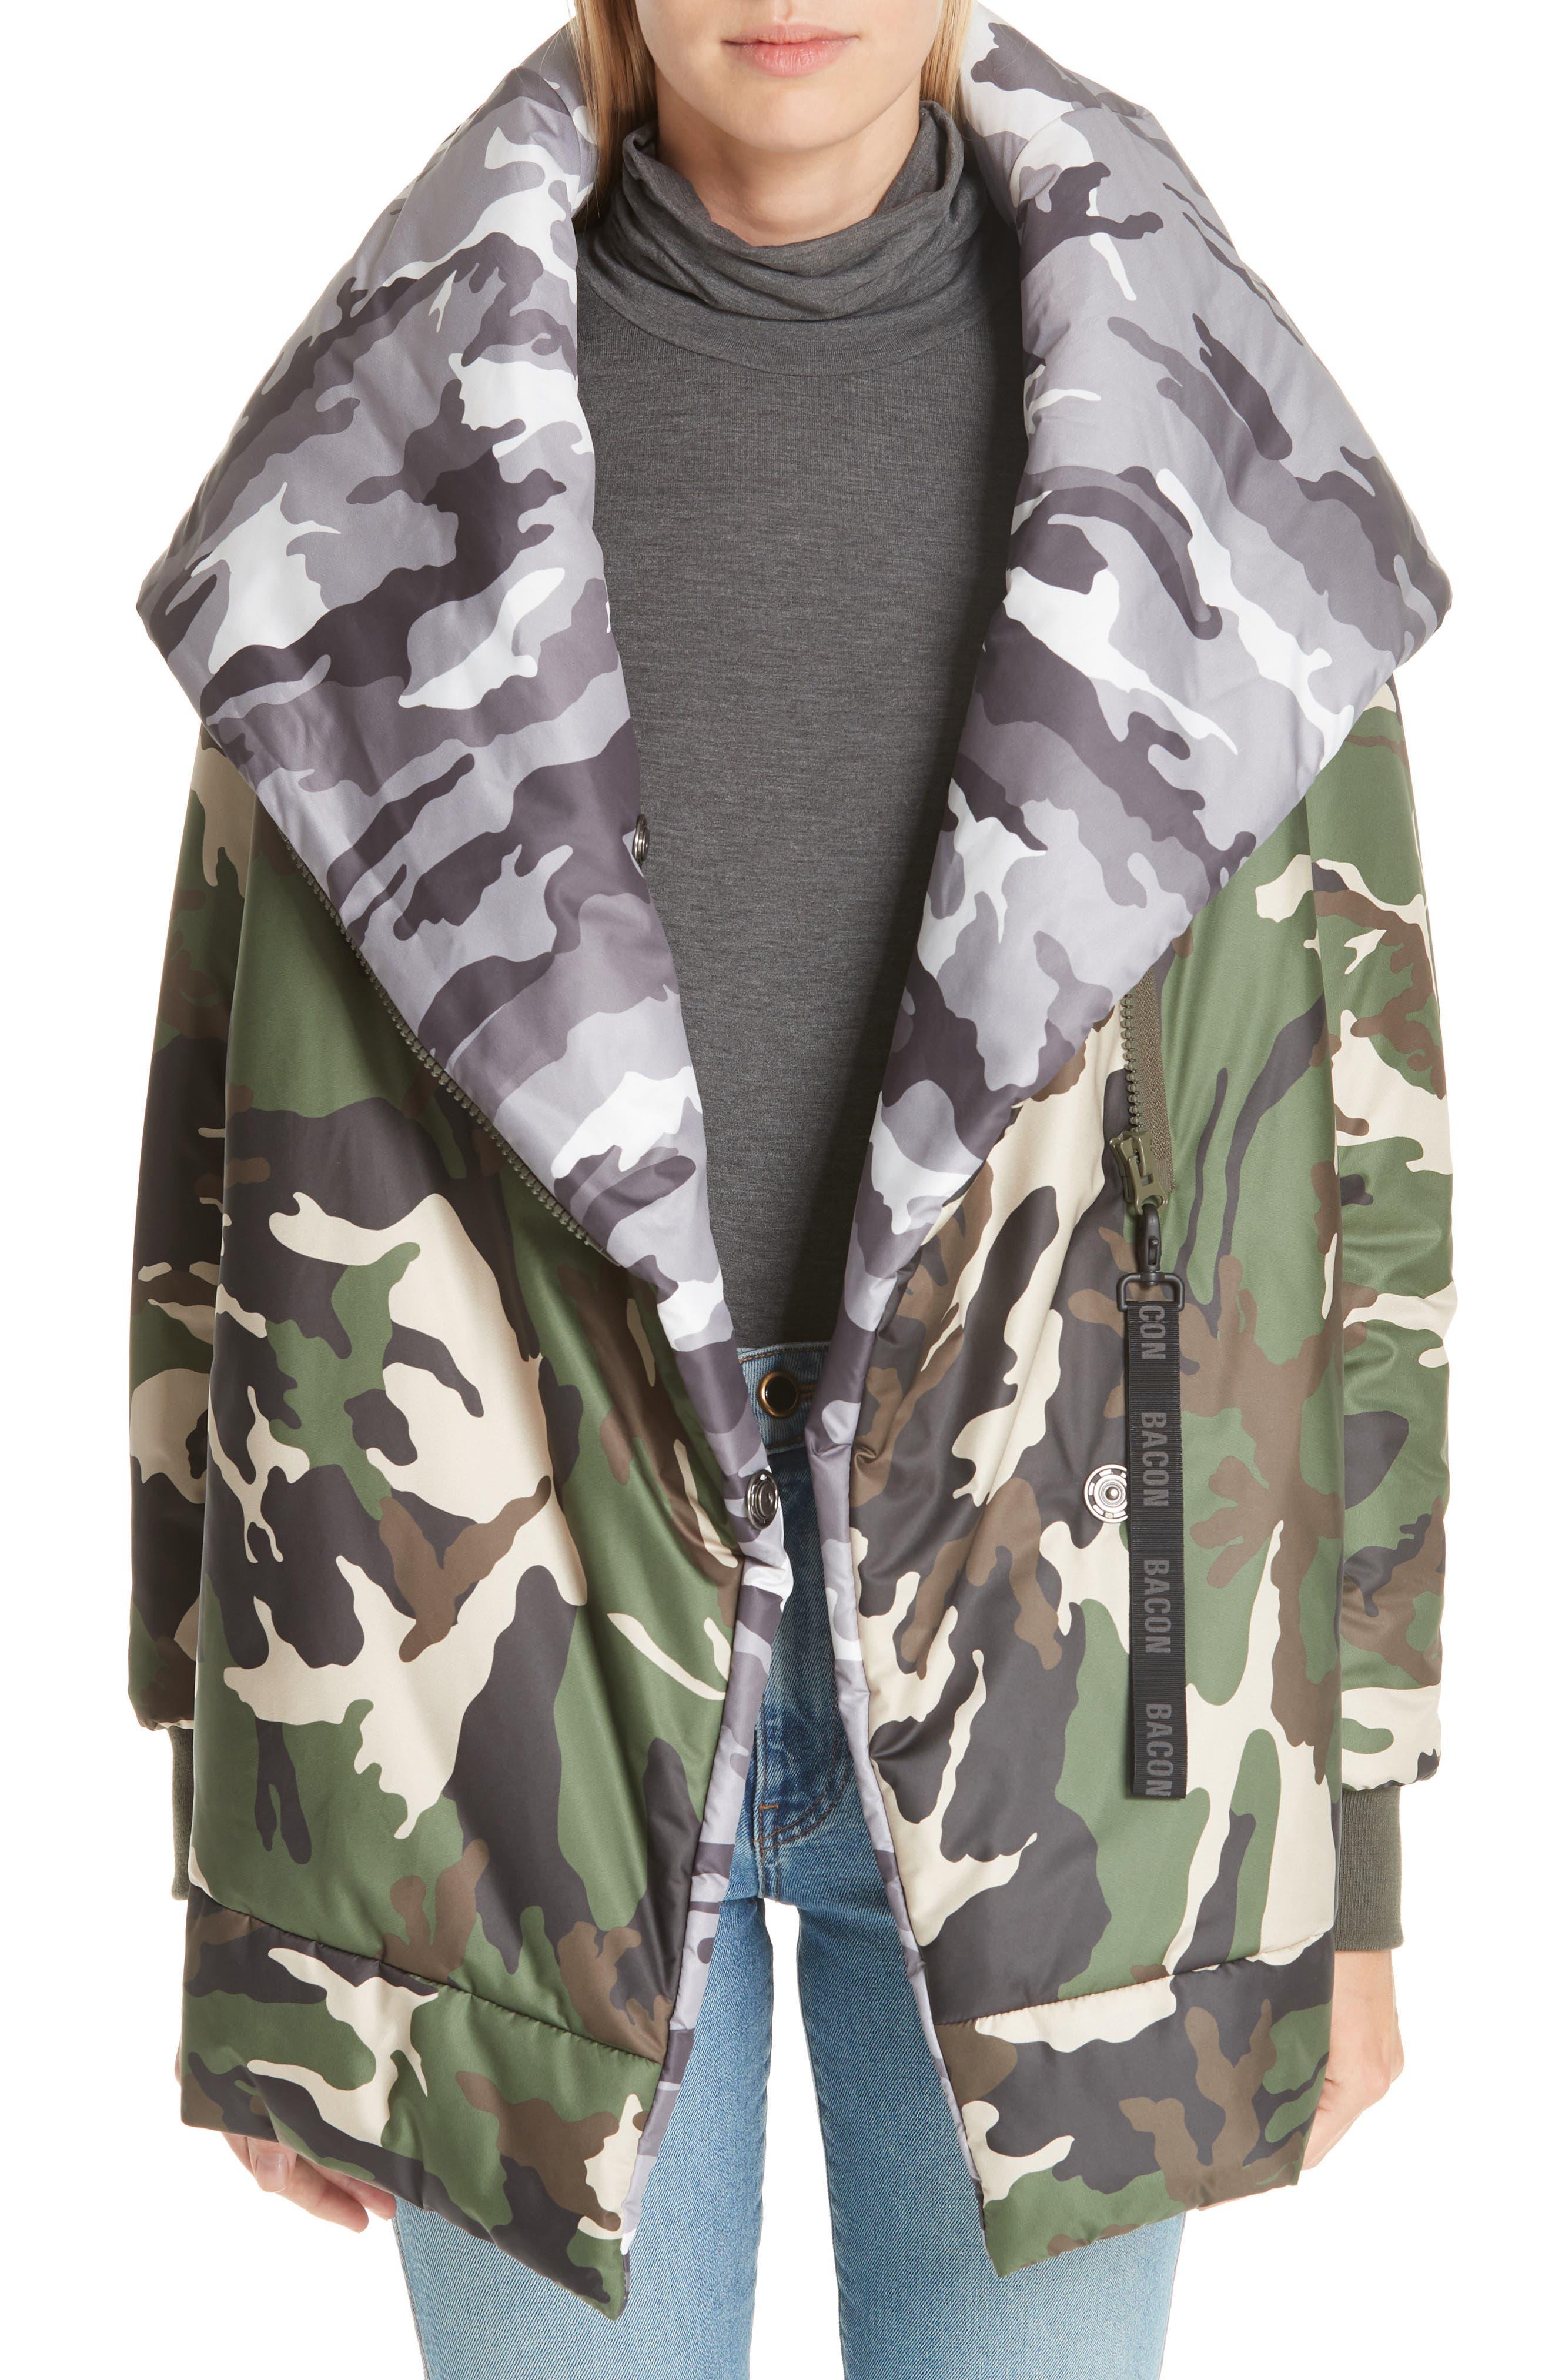 BACON Big Blanket 78 Camo Puffer Coat, Main, color, 300